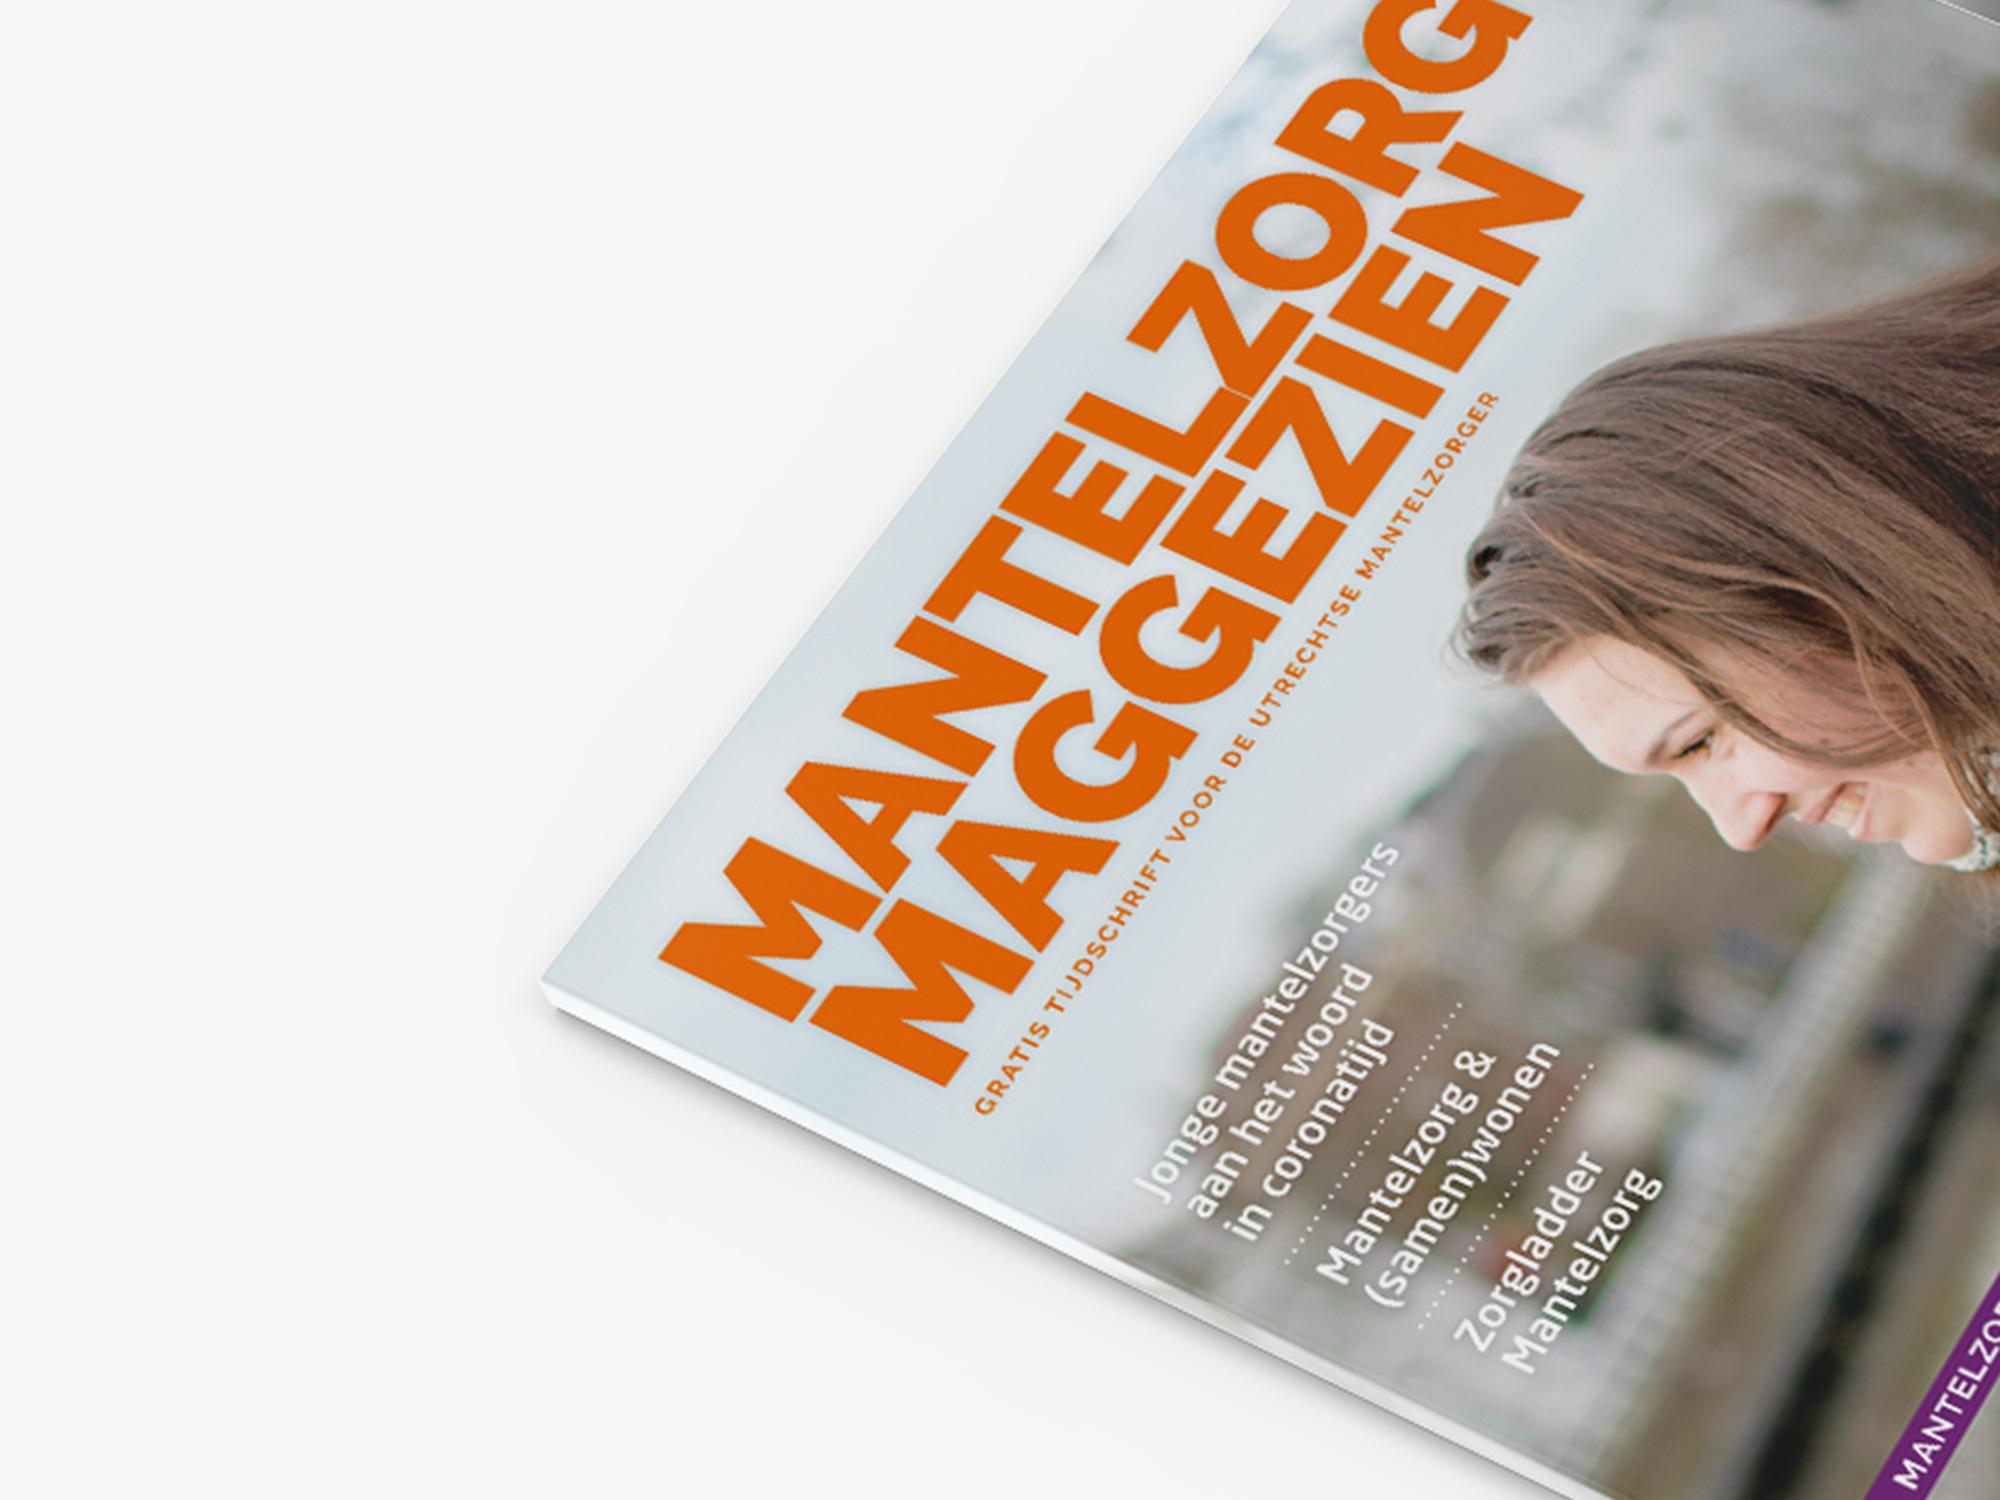 Magazine opmaak – Mantelzorg U-centraal